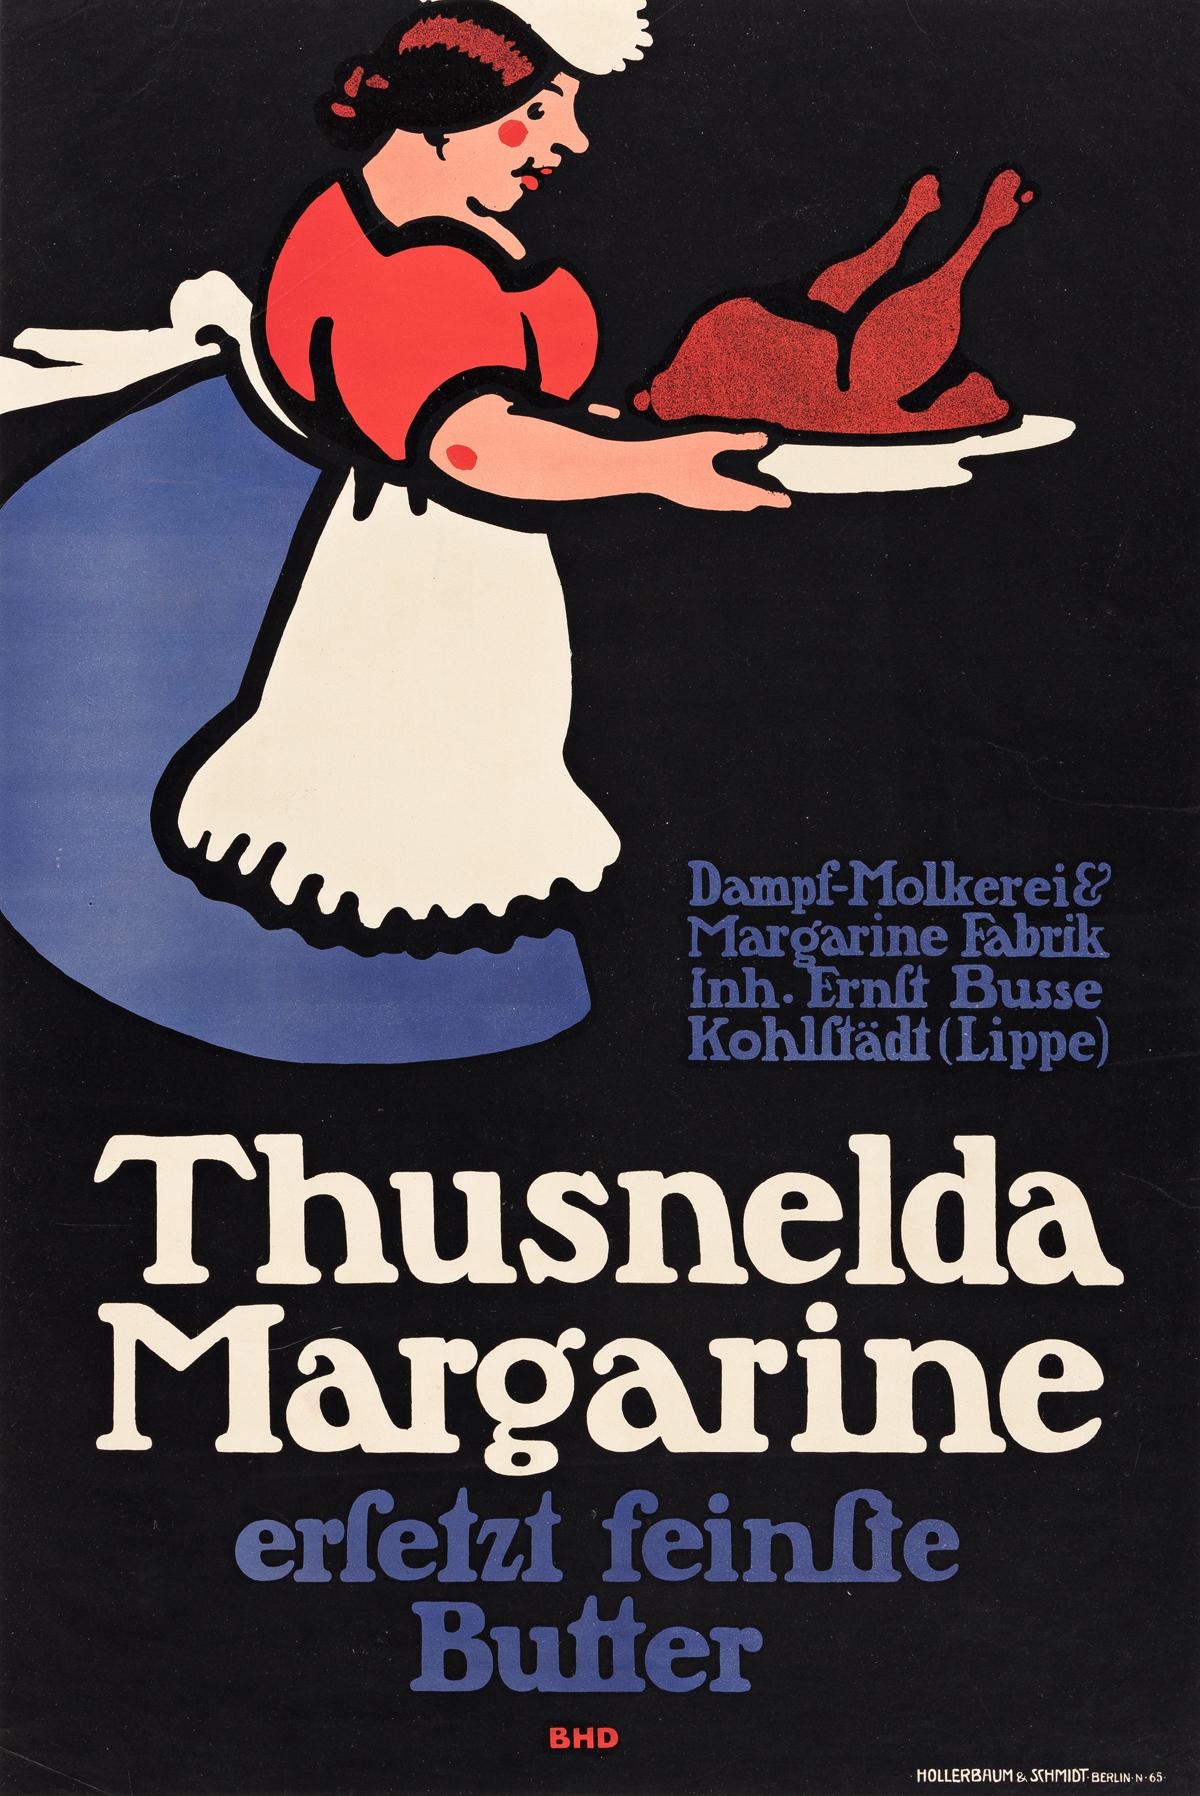 LUCIAN BERNHARD (1883-1972).  THUSNELDA MARGARINE. Circa 1910. 27½x18½ inches, 69¾x47 cm. Hollerbaum & Schmidt, Berlin.